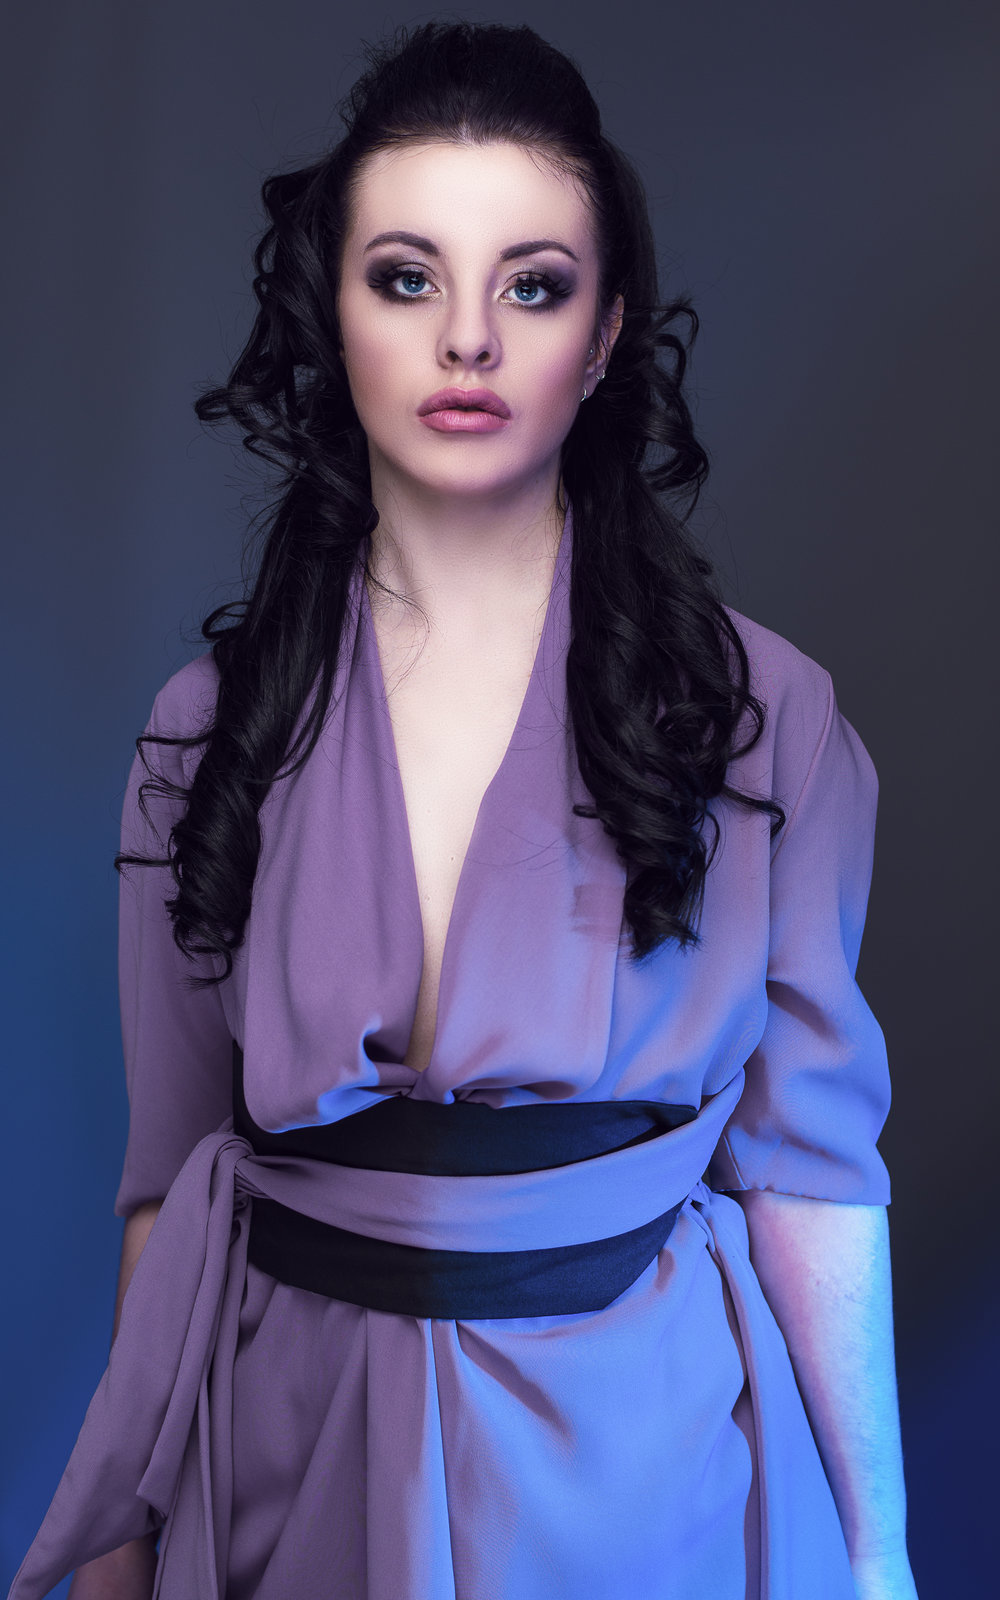 zaramia-ava-zaramiaava-leeds-fashion-designer-ethical-sustainable-tailored-minimalist-jacket-maika-mauve-black-obi-belt-dress-versatile-drape-cowl-styling-studio-womenswear-models-photoshoot-11